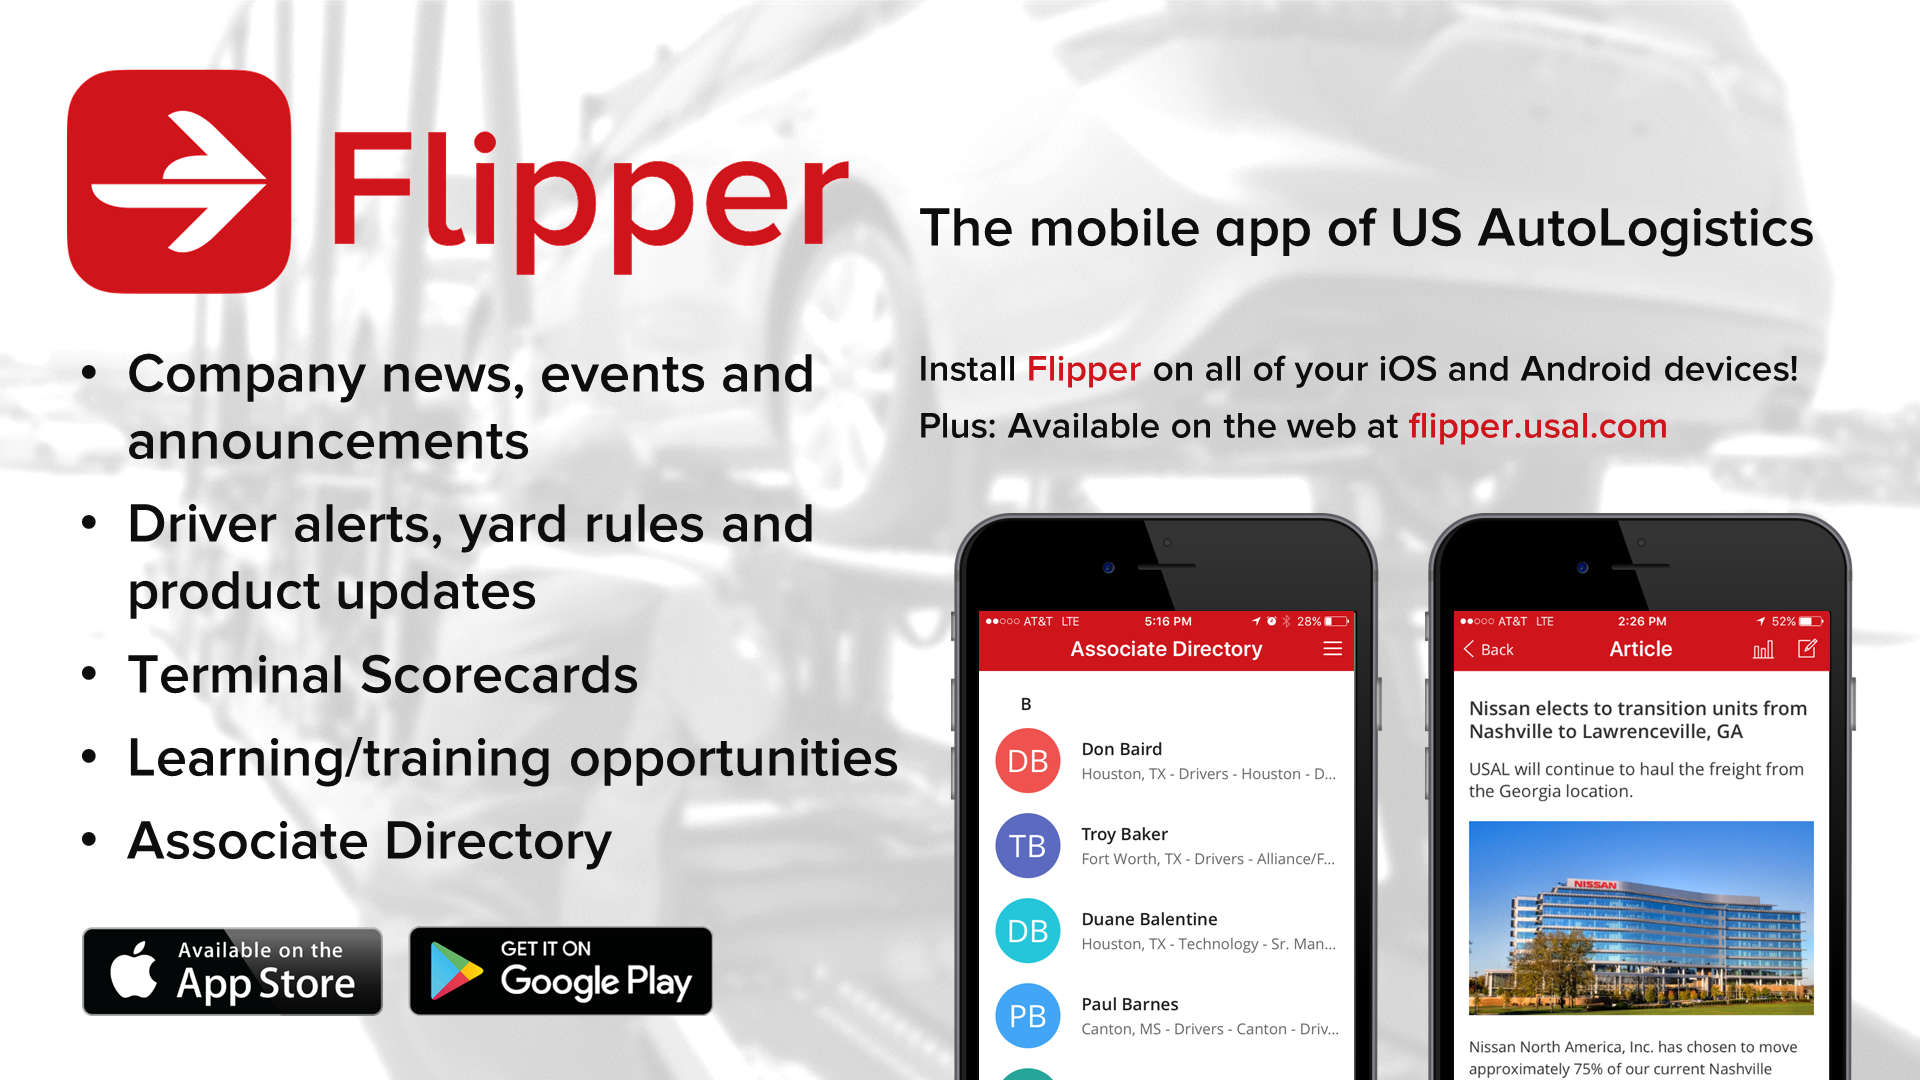 USAL employee app Flipper internal communication